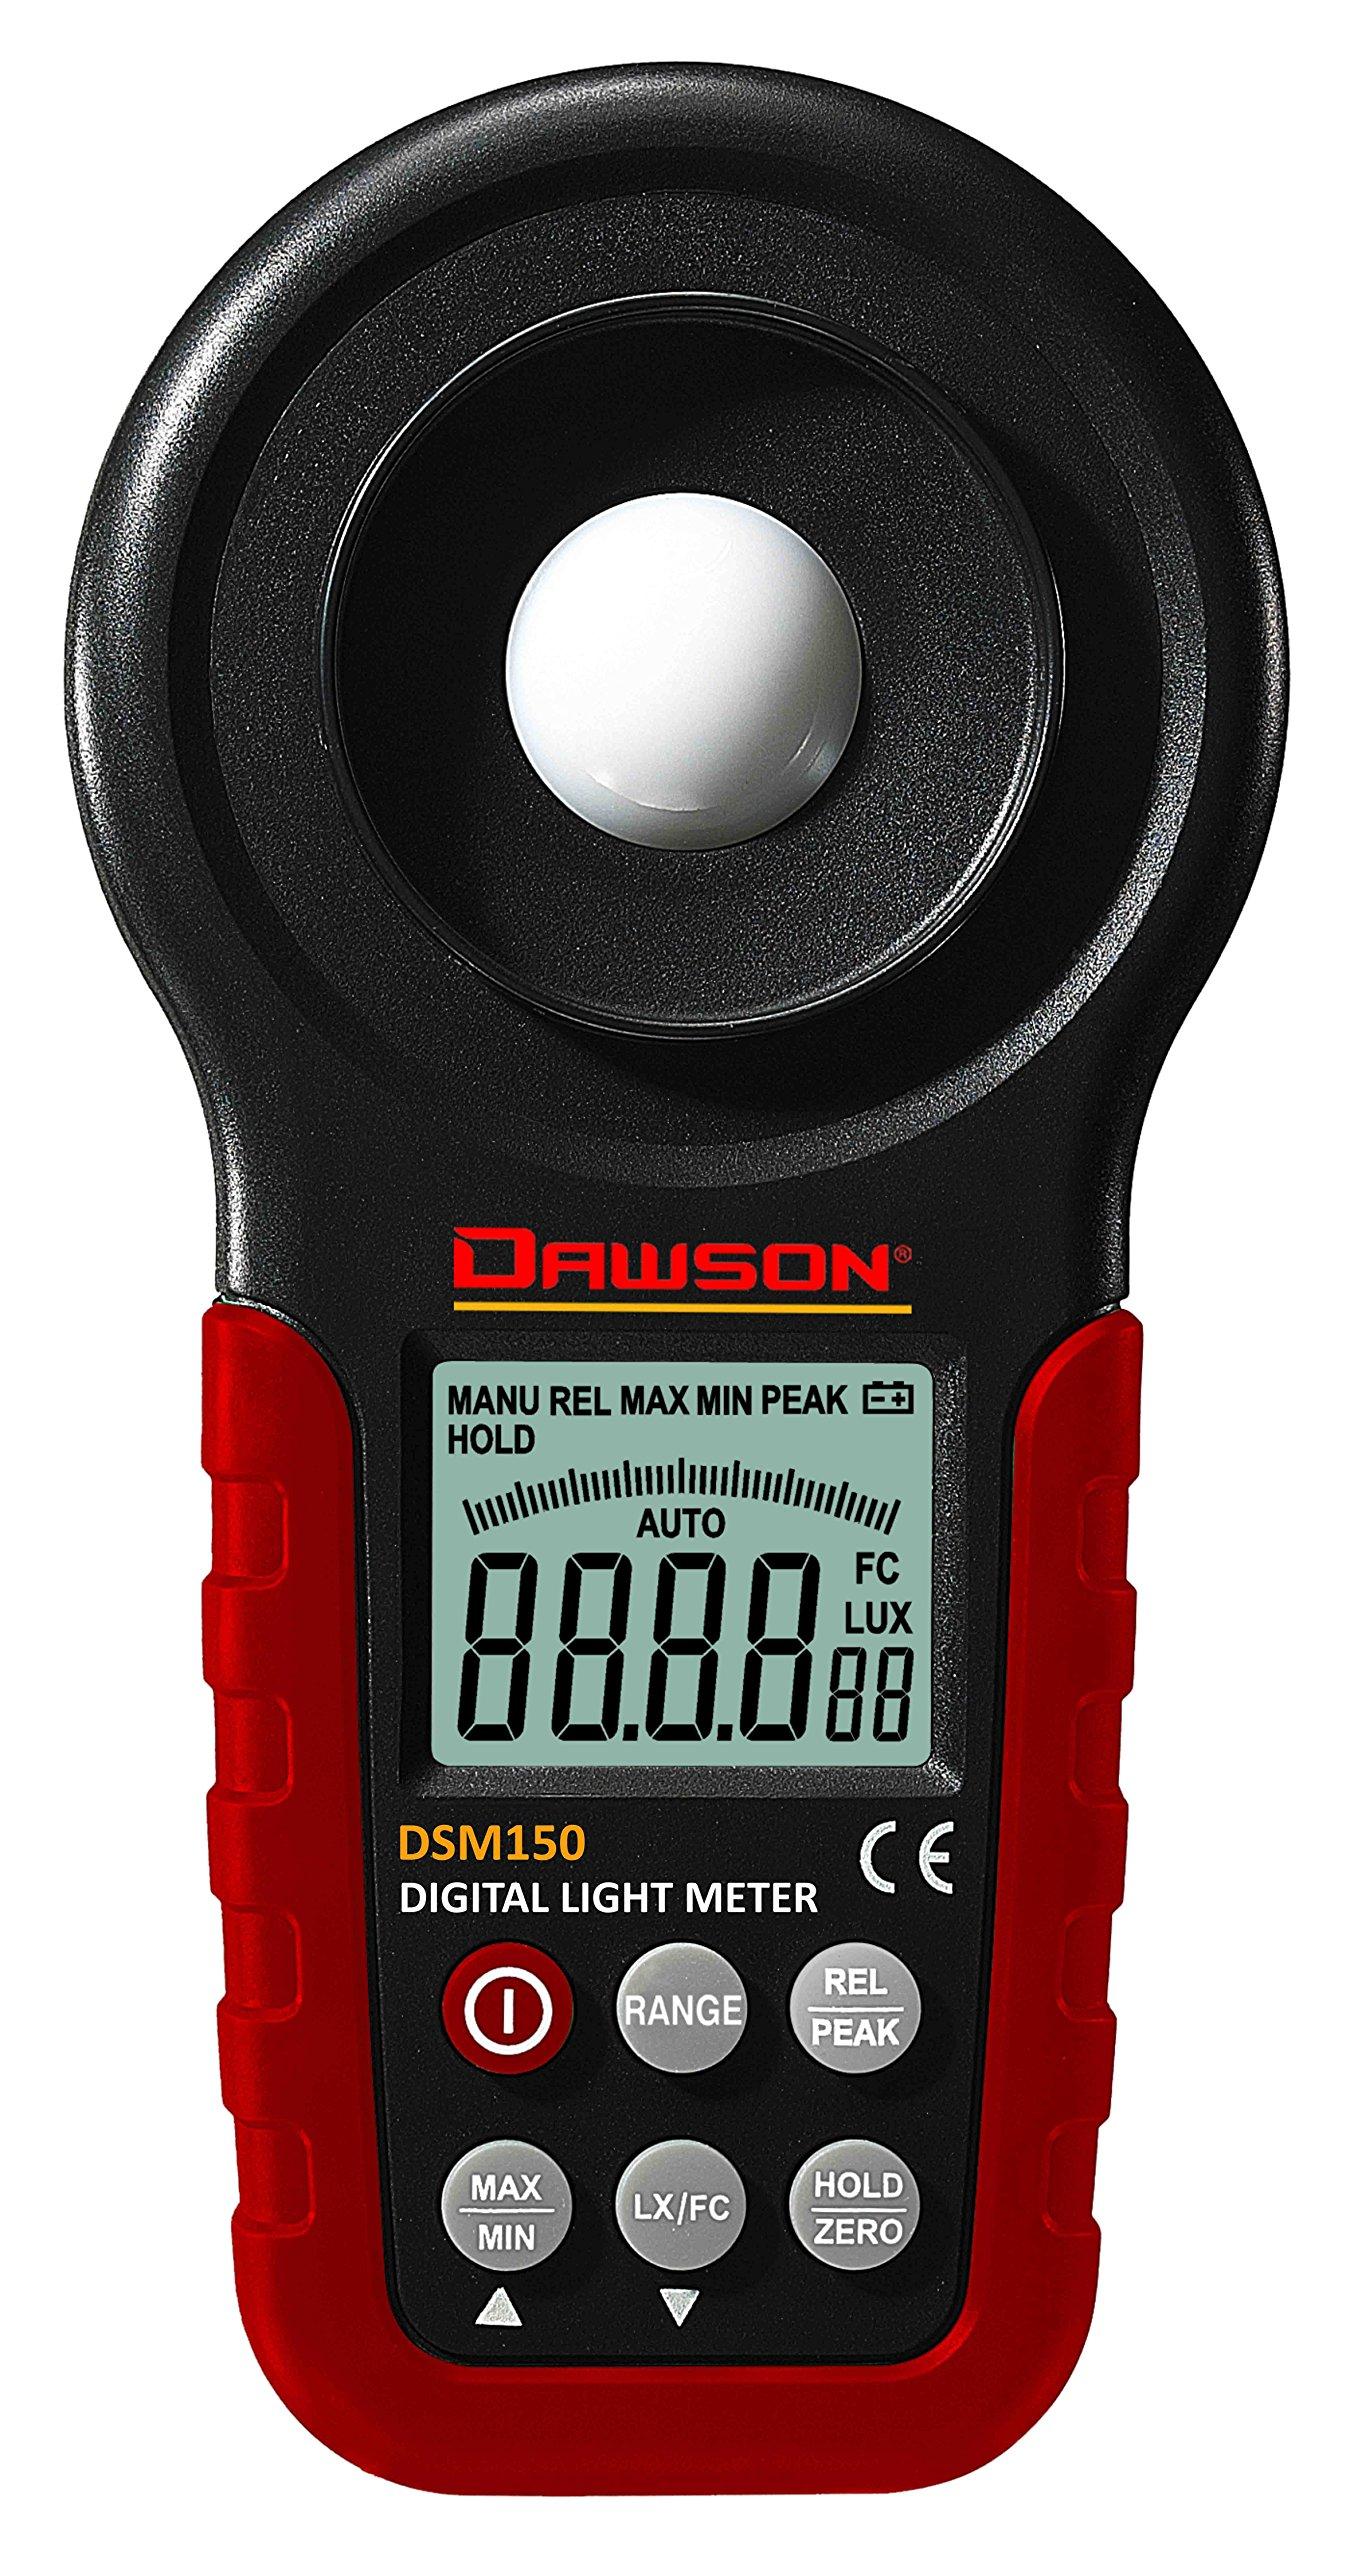 Dawson Tools DSM150 Digital Light Meter Photometer by Dawson Tools